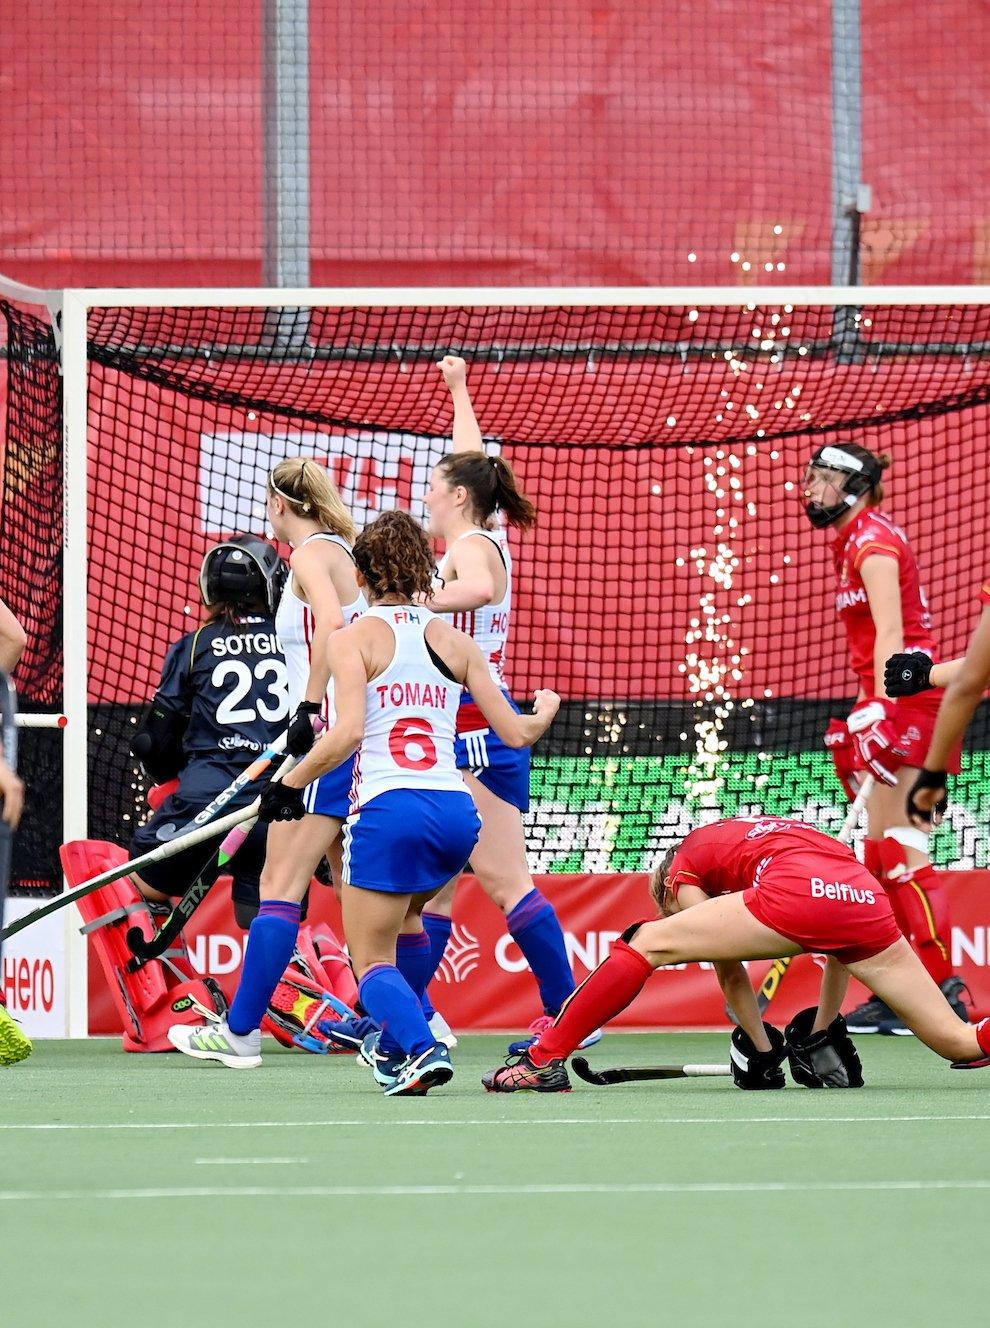 <p>GB women's hockey announce title sponsor </p>